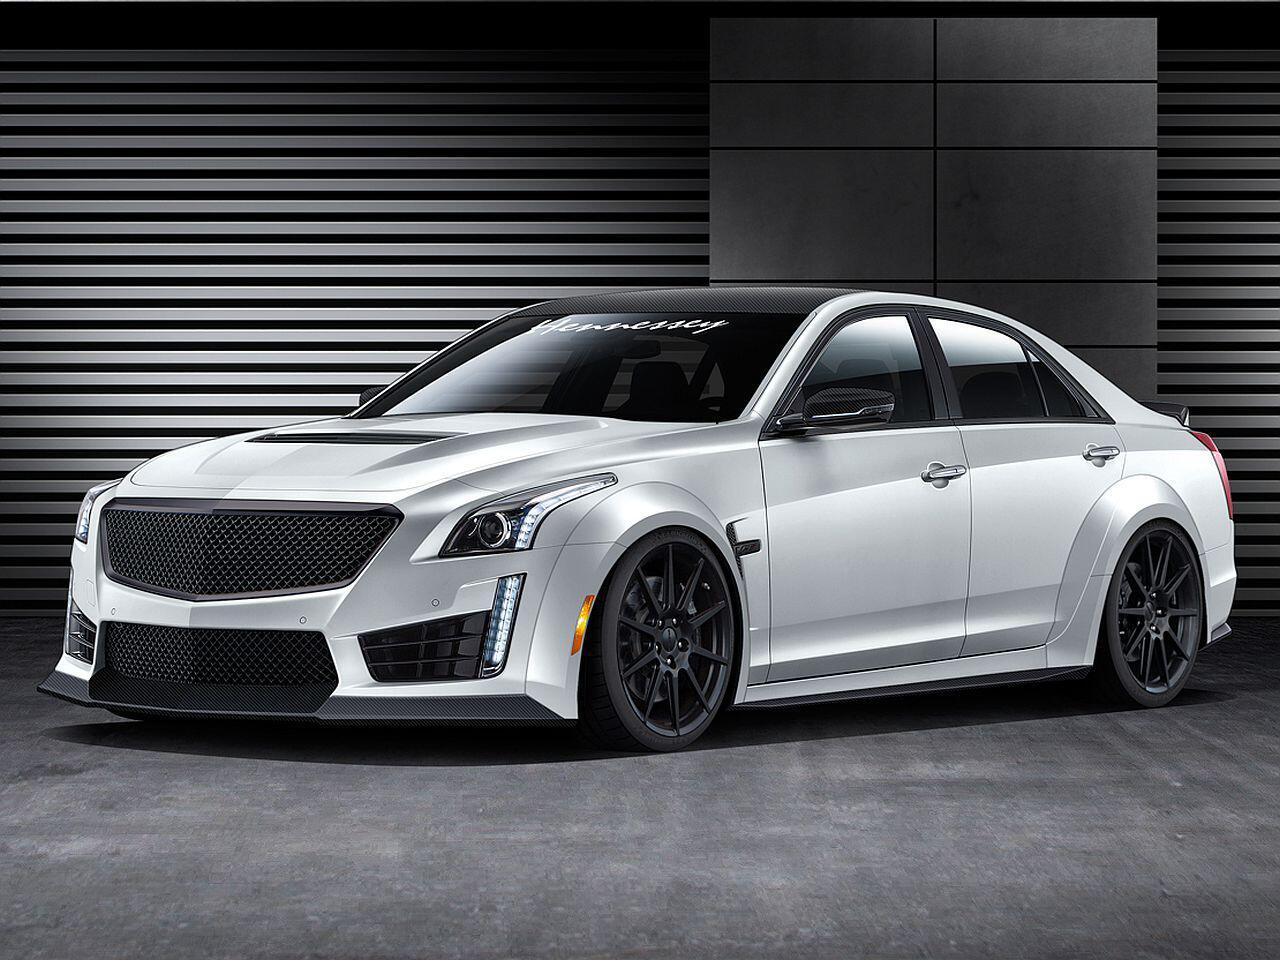 Bild zu Hennessey Cadillac CTS-V 2016